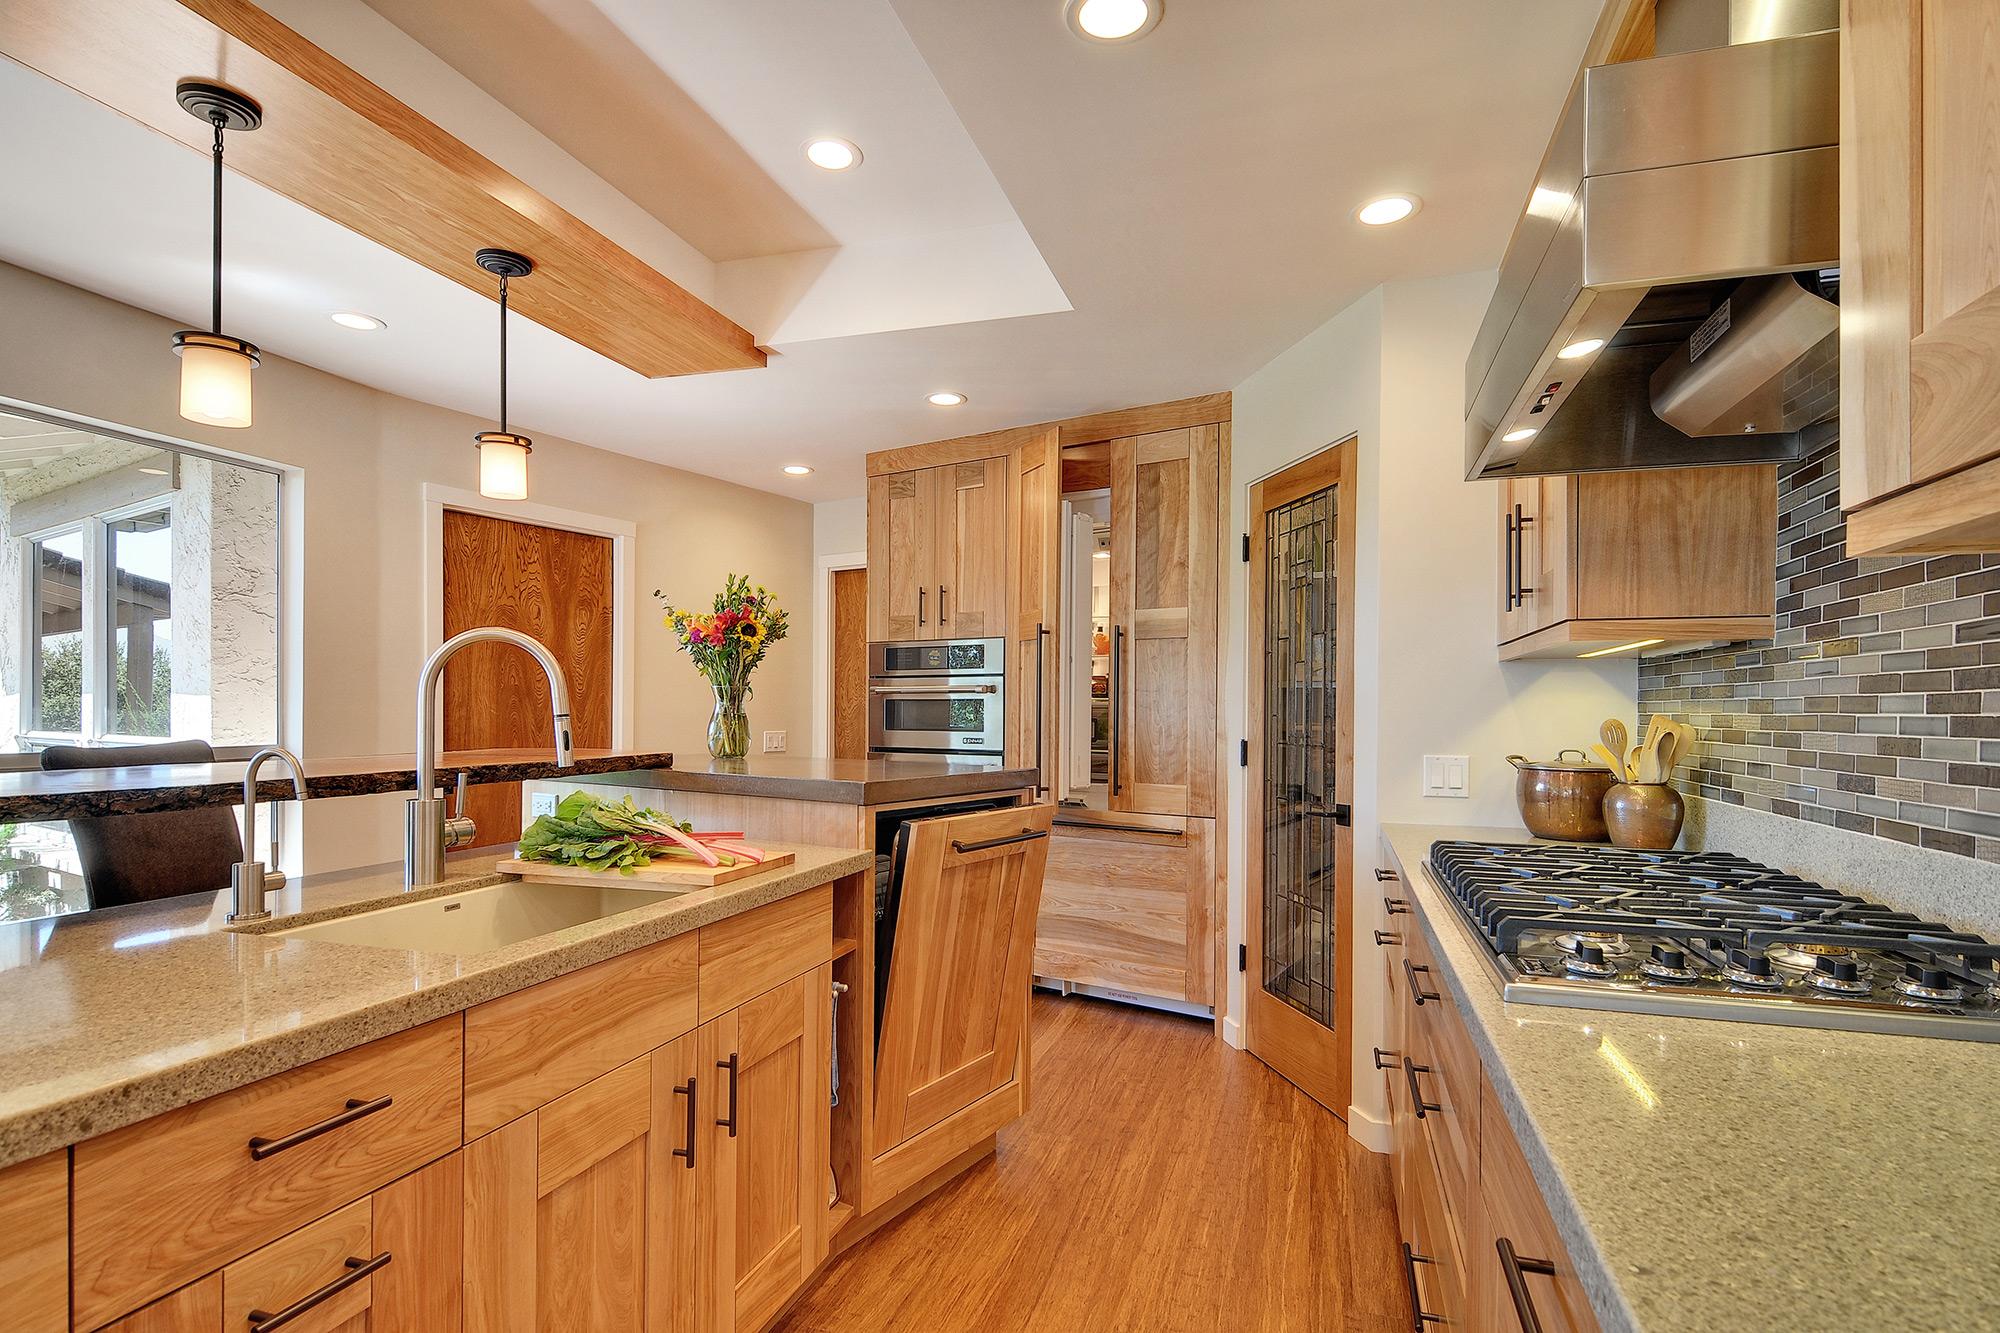 Gallery Warm Natural Kitchen Saratoga